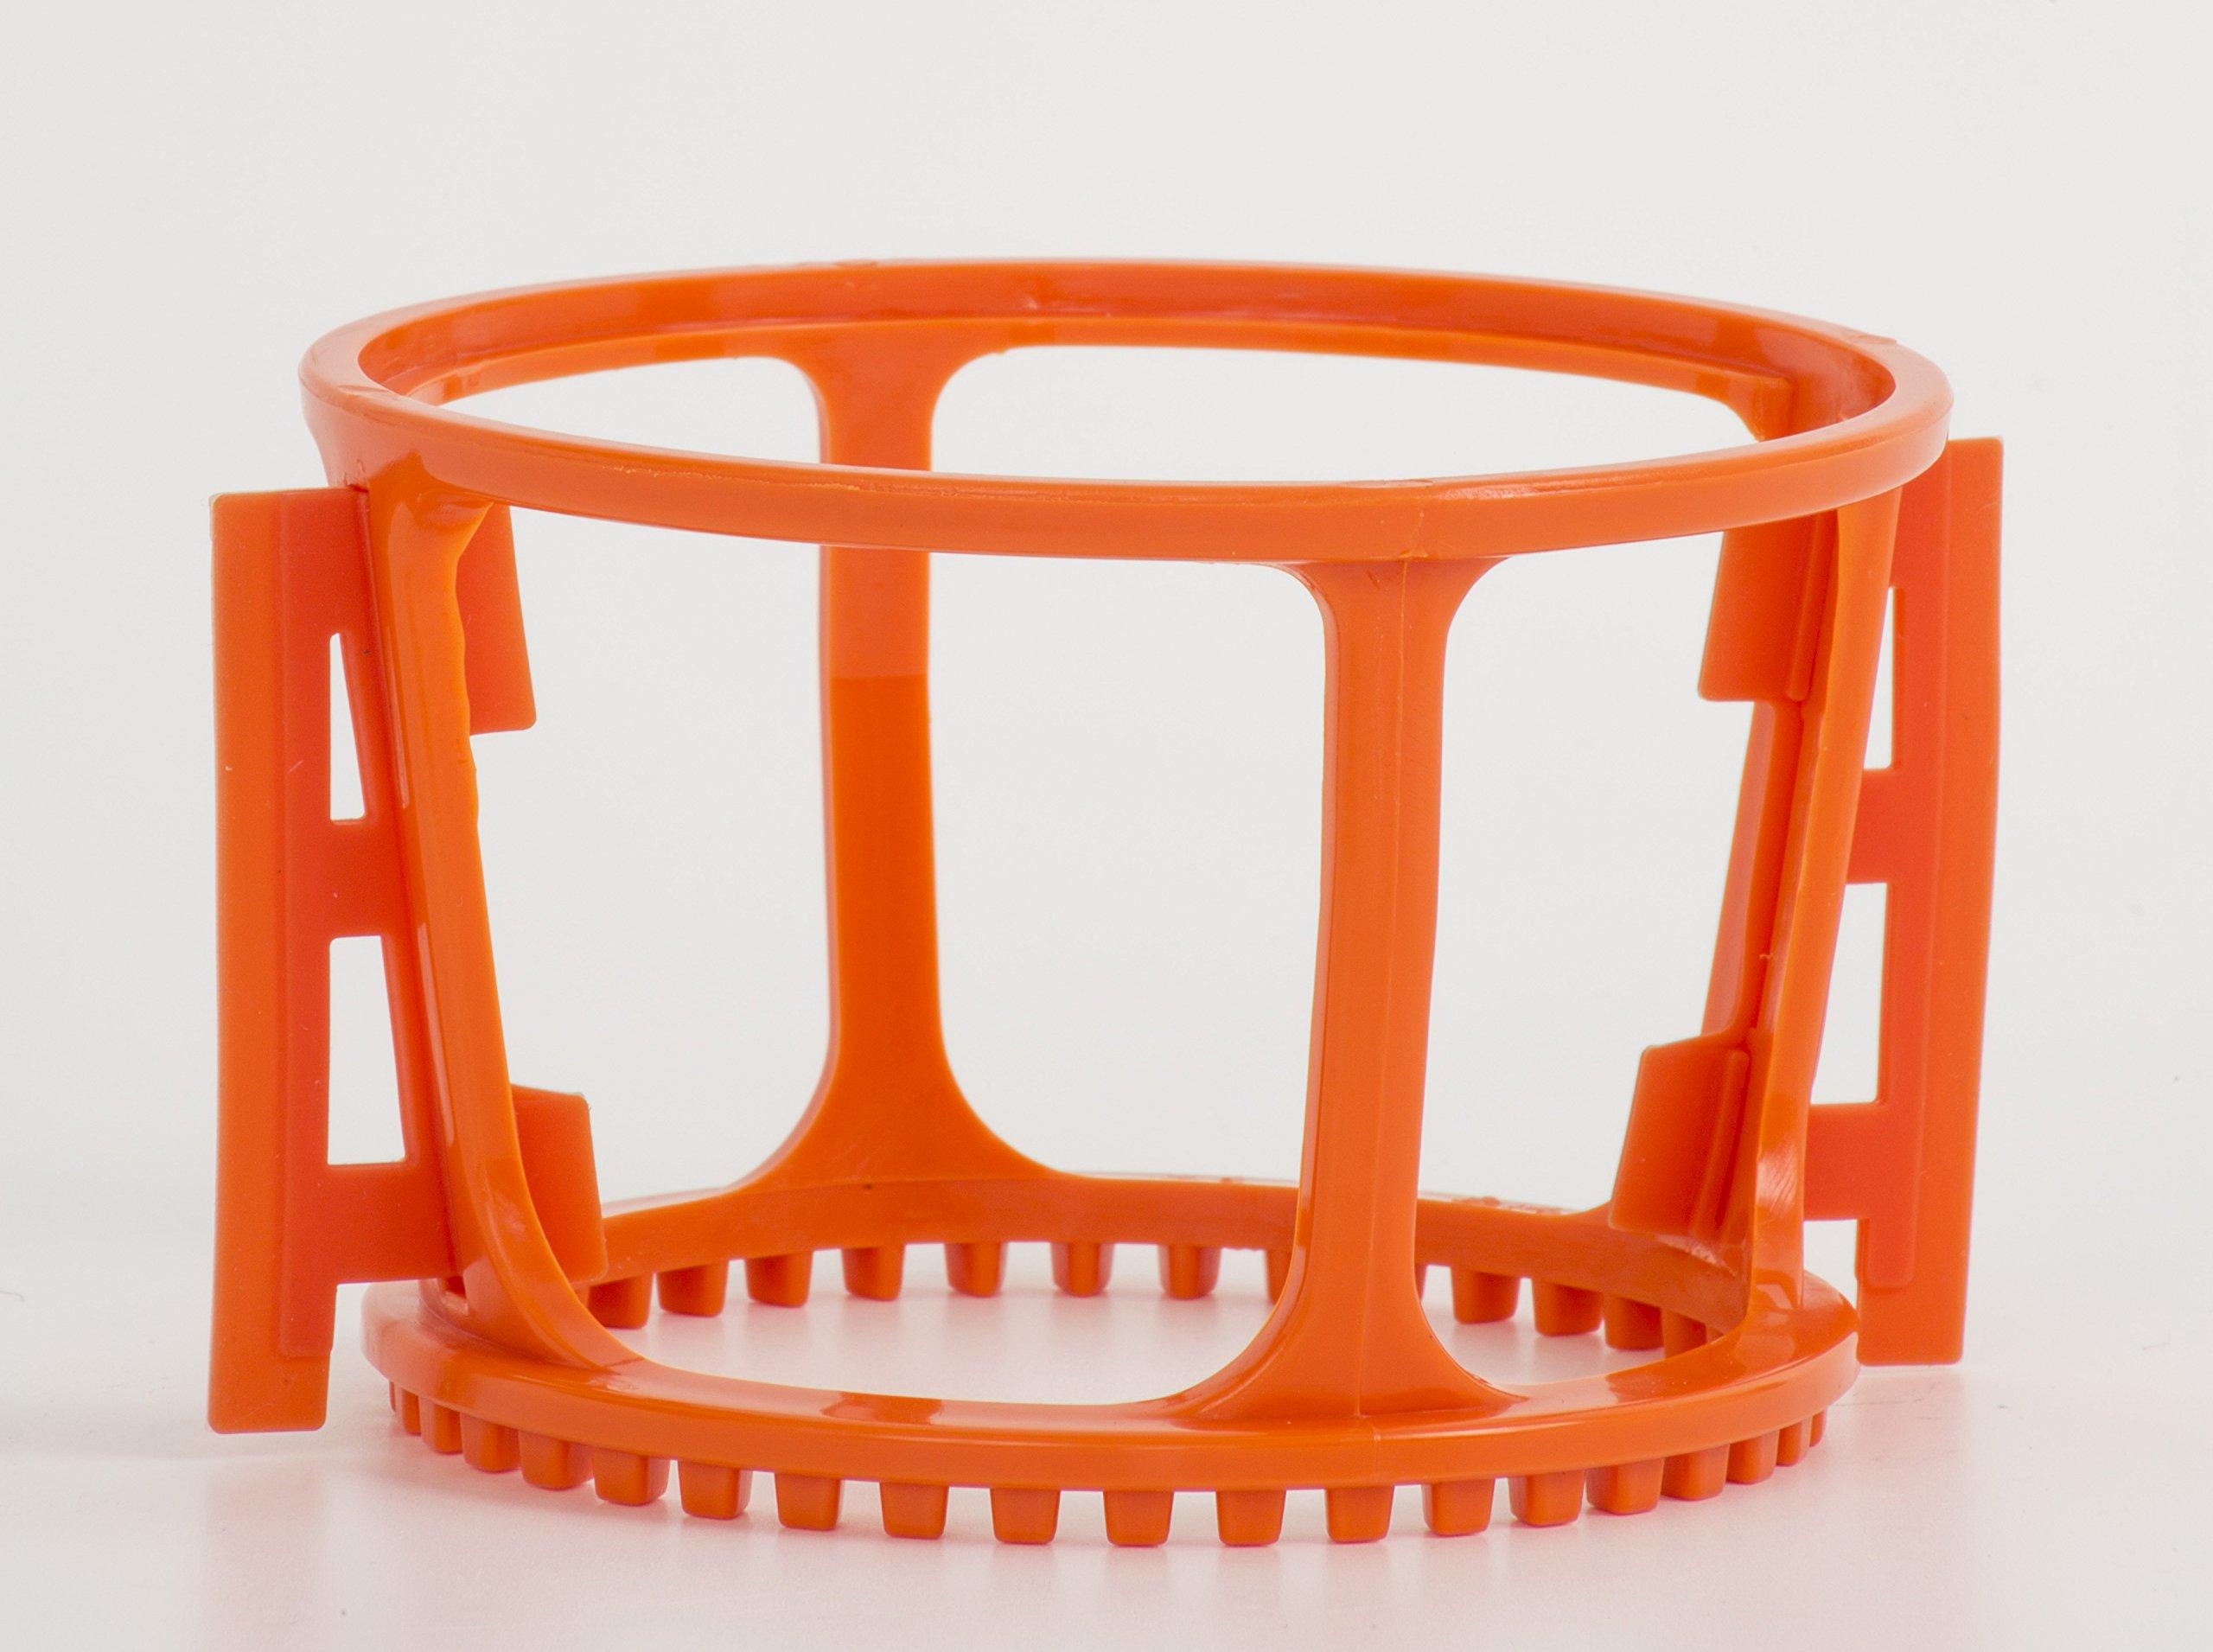 RGV Juice Art Digital Estrattore, 200 W, plastica, Argento - 2021 -